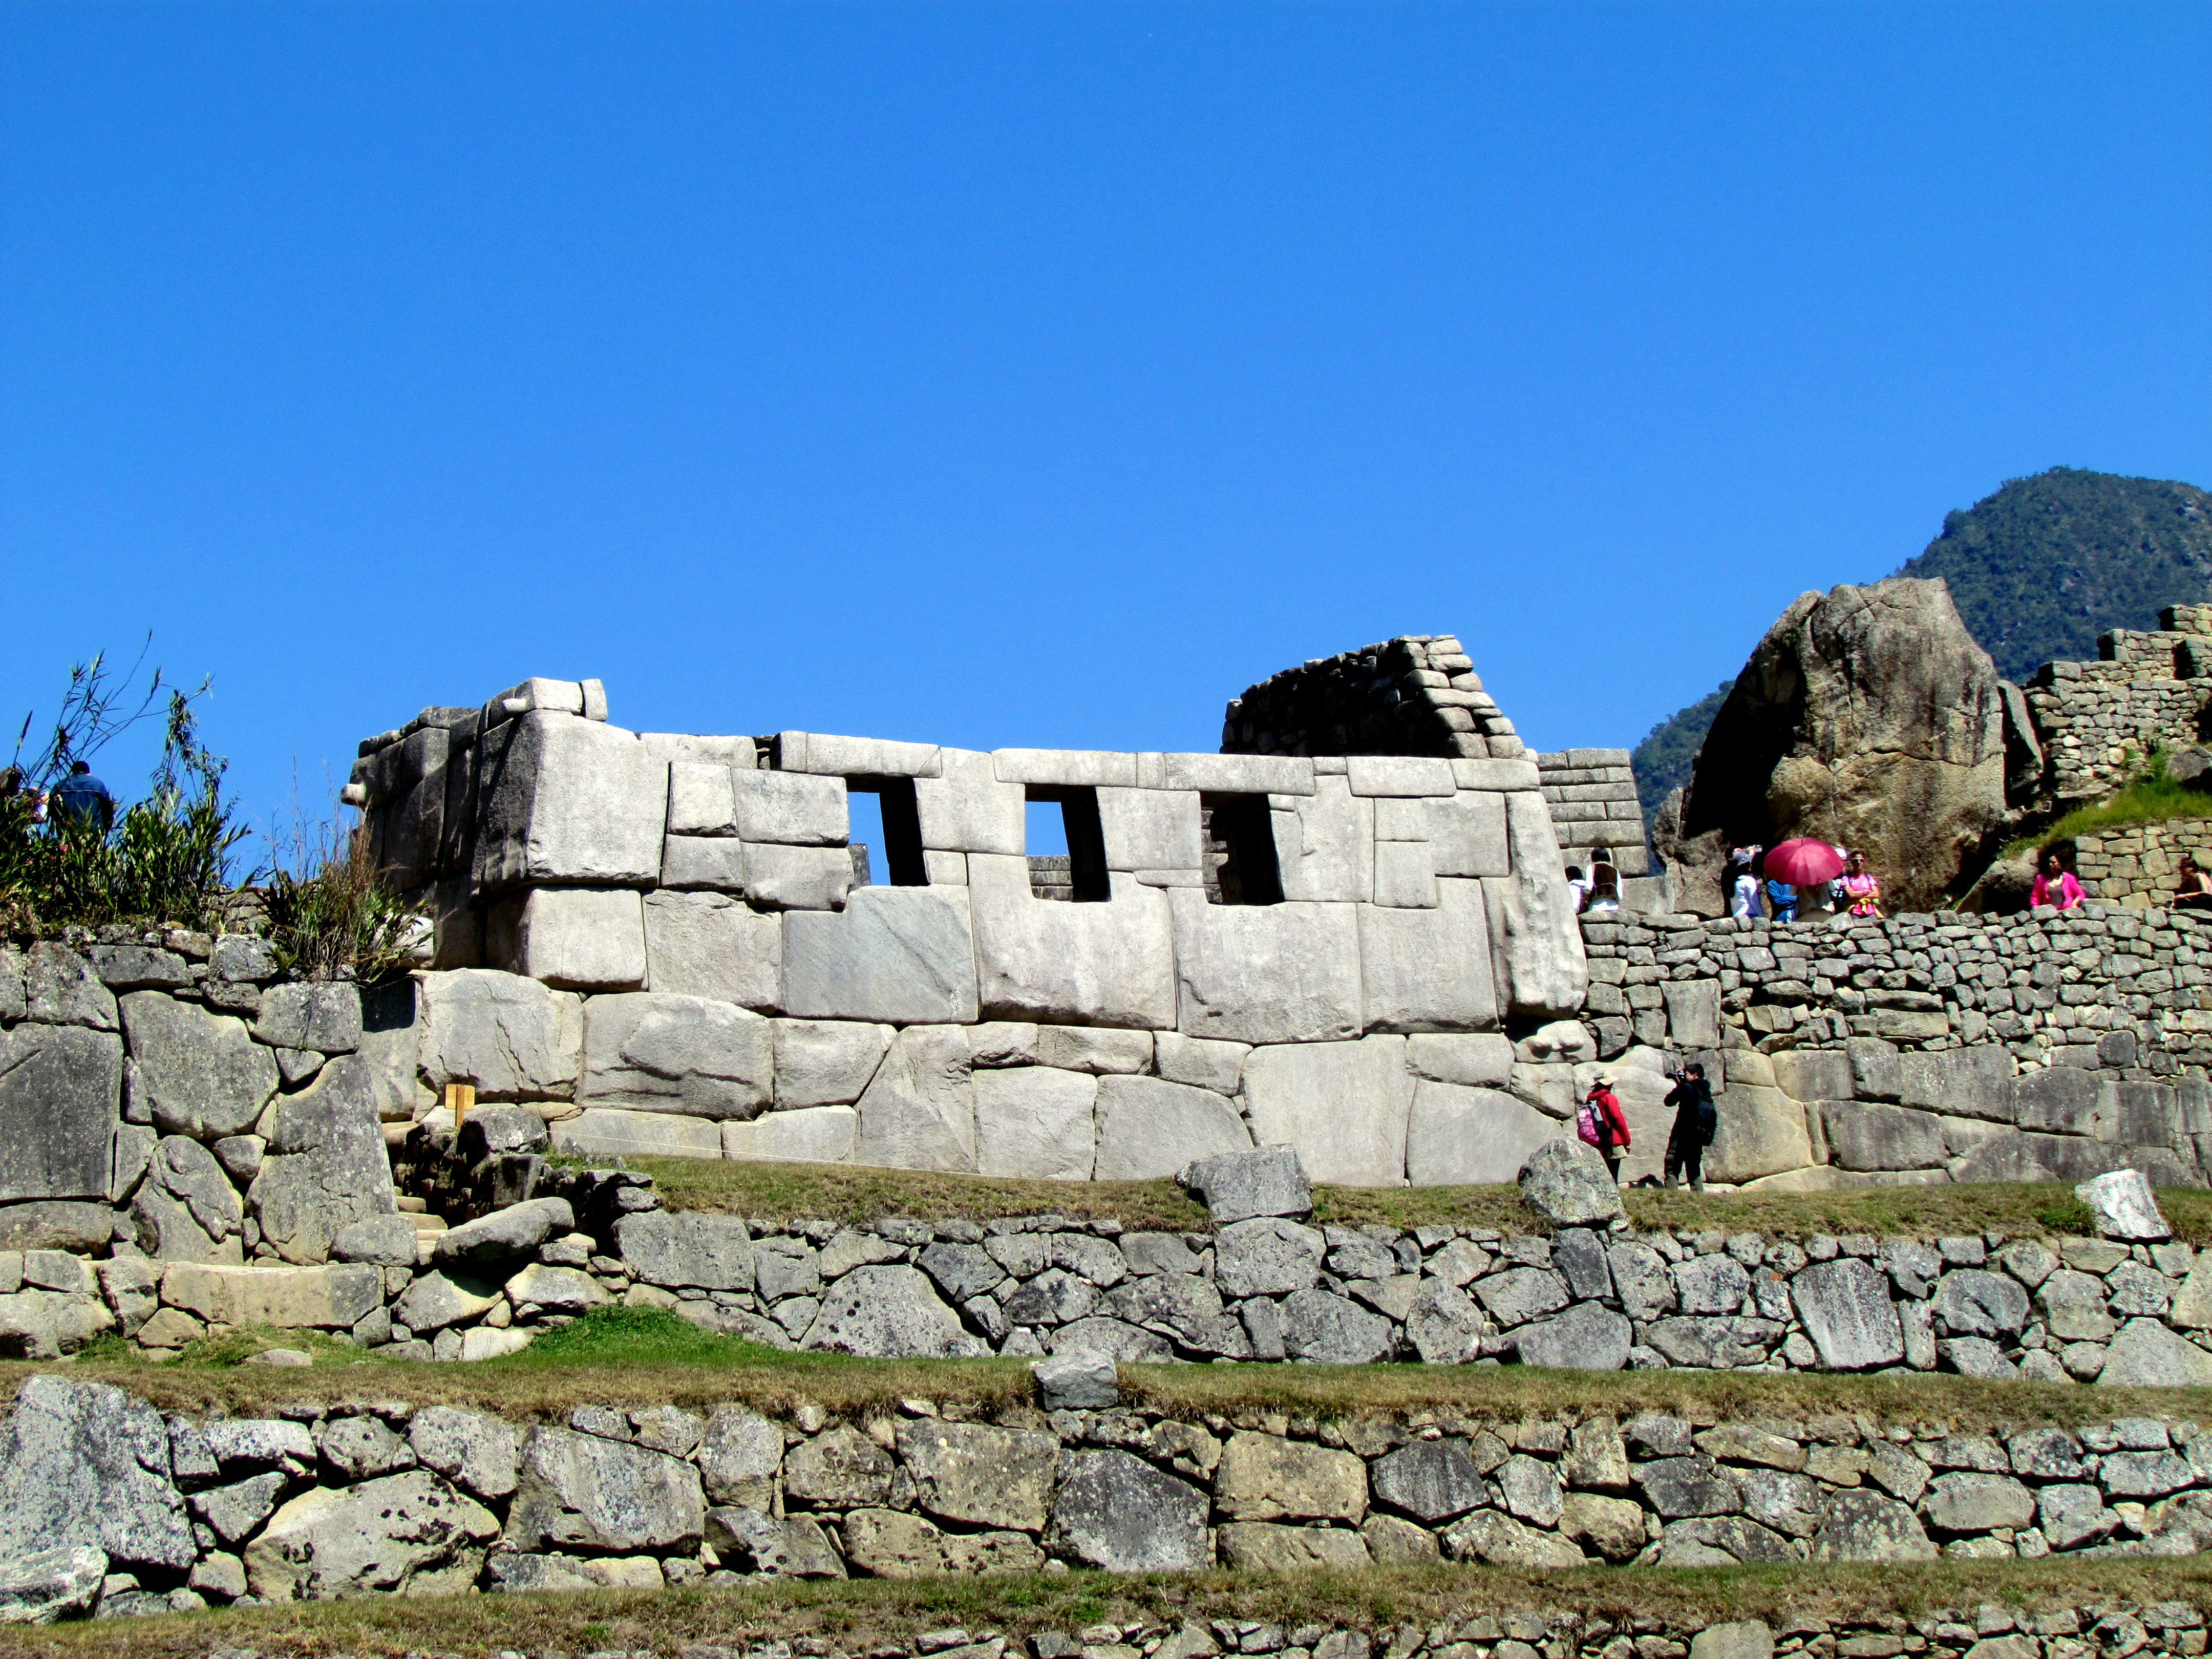 File:19 Temple of the Three Windows Machu Picchu Peru 2538  (14977956488).jpg - Wikimedia Commons